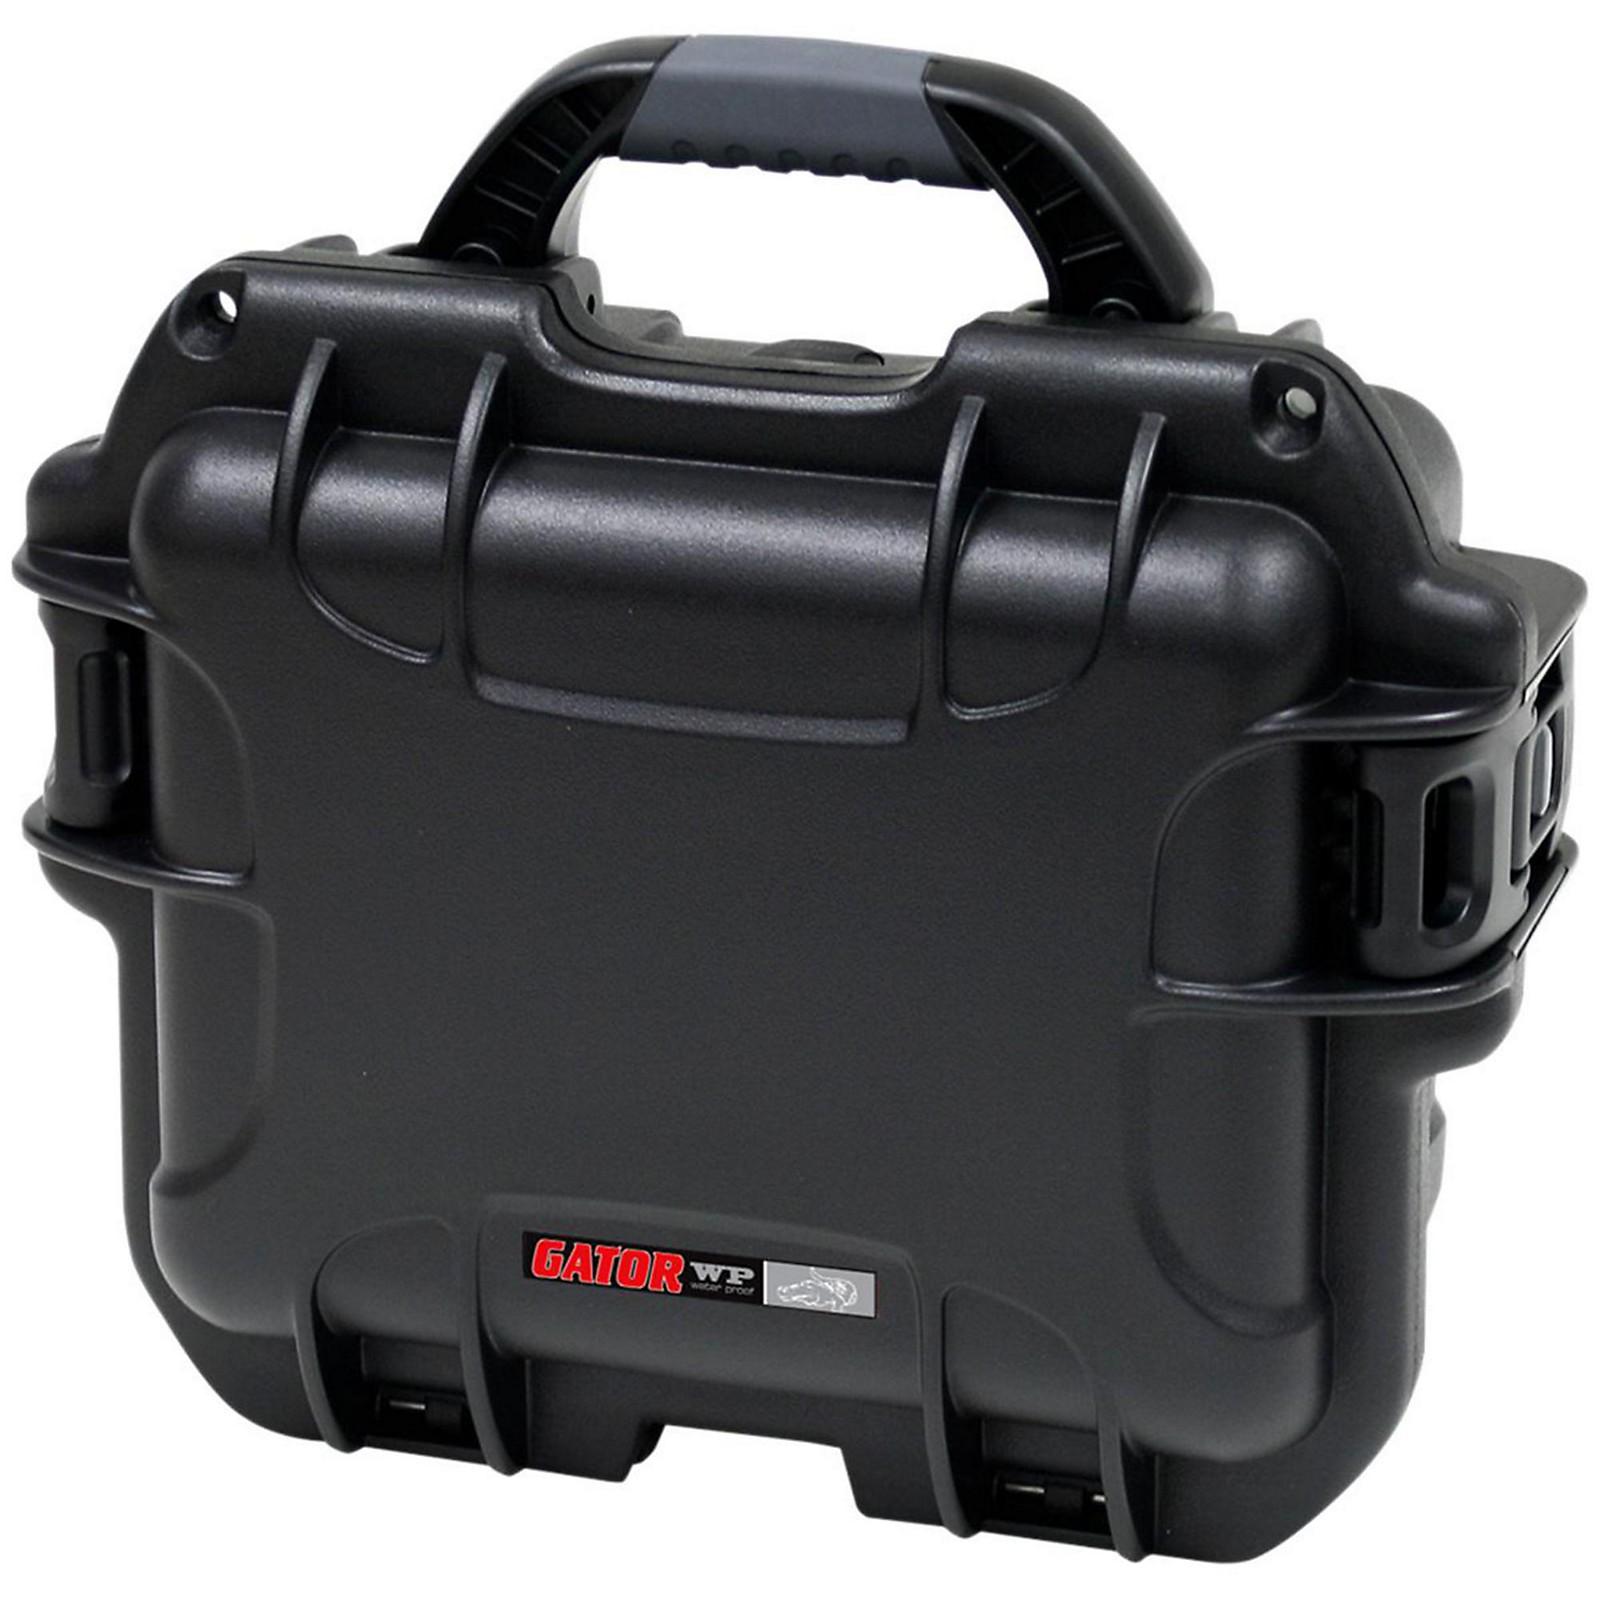 Gator GU-0907-05-WPNF Waterproof Injection Molded Case